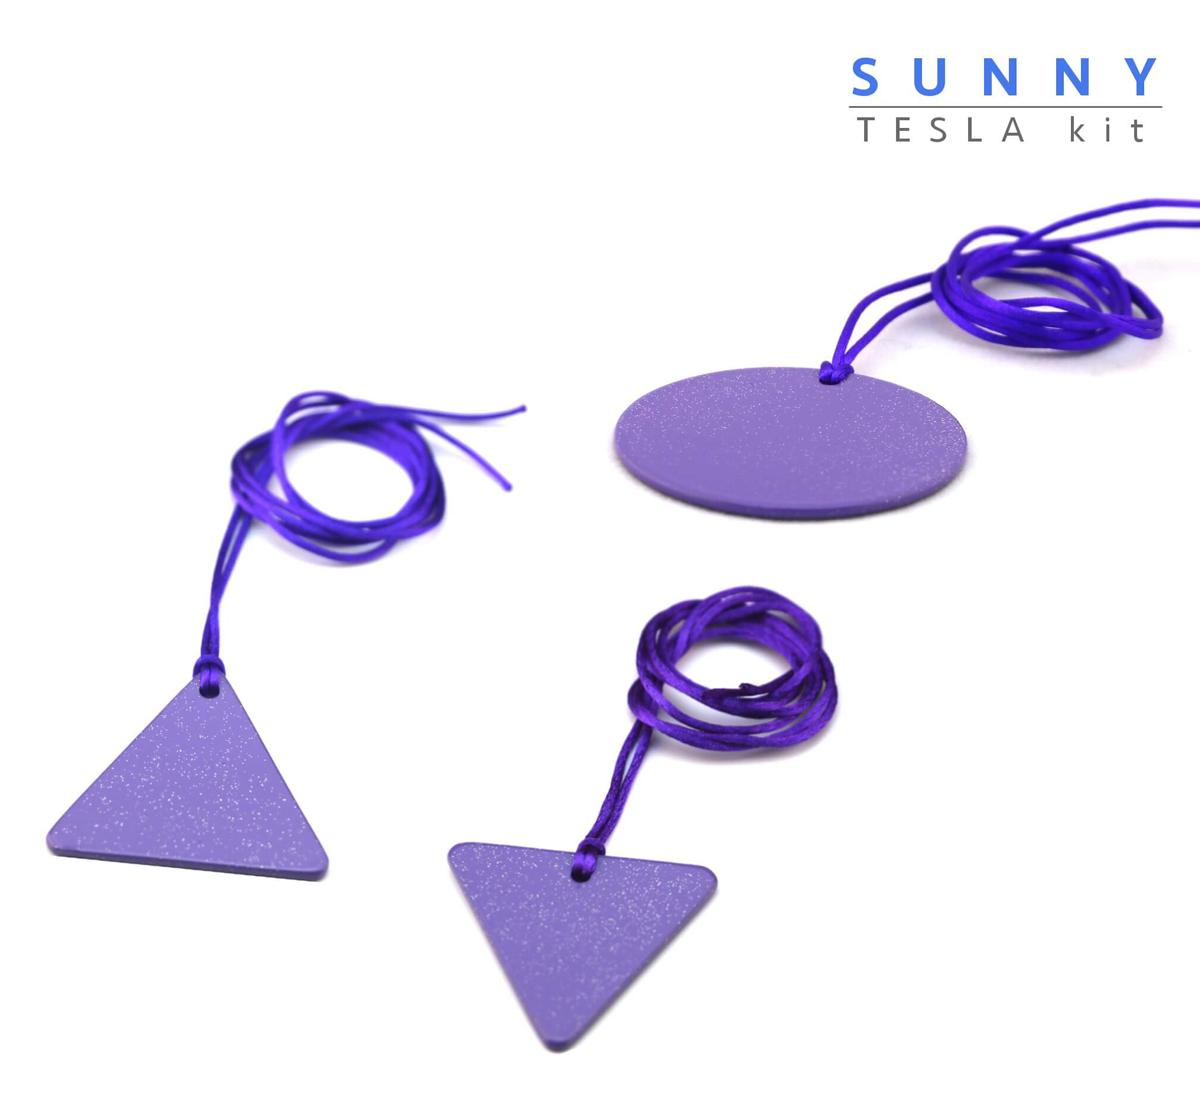 Piastre Di Tesla Funzionano sunny piastre di tesla purpuree - kit partner